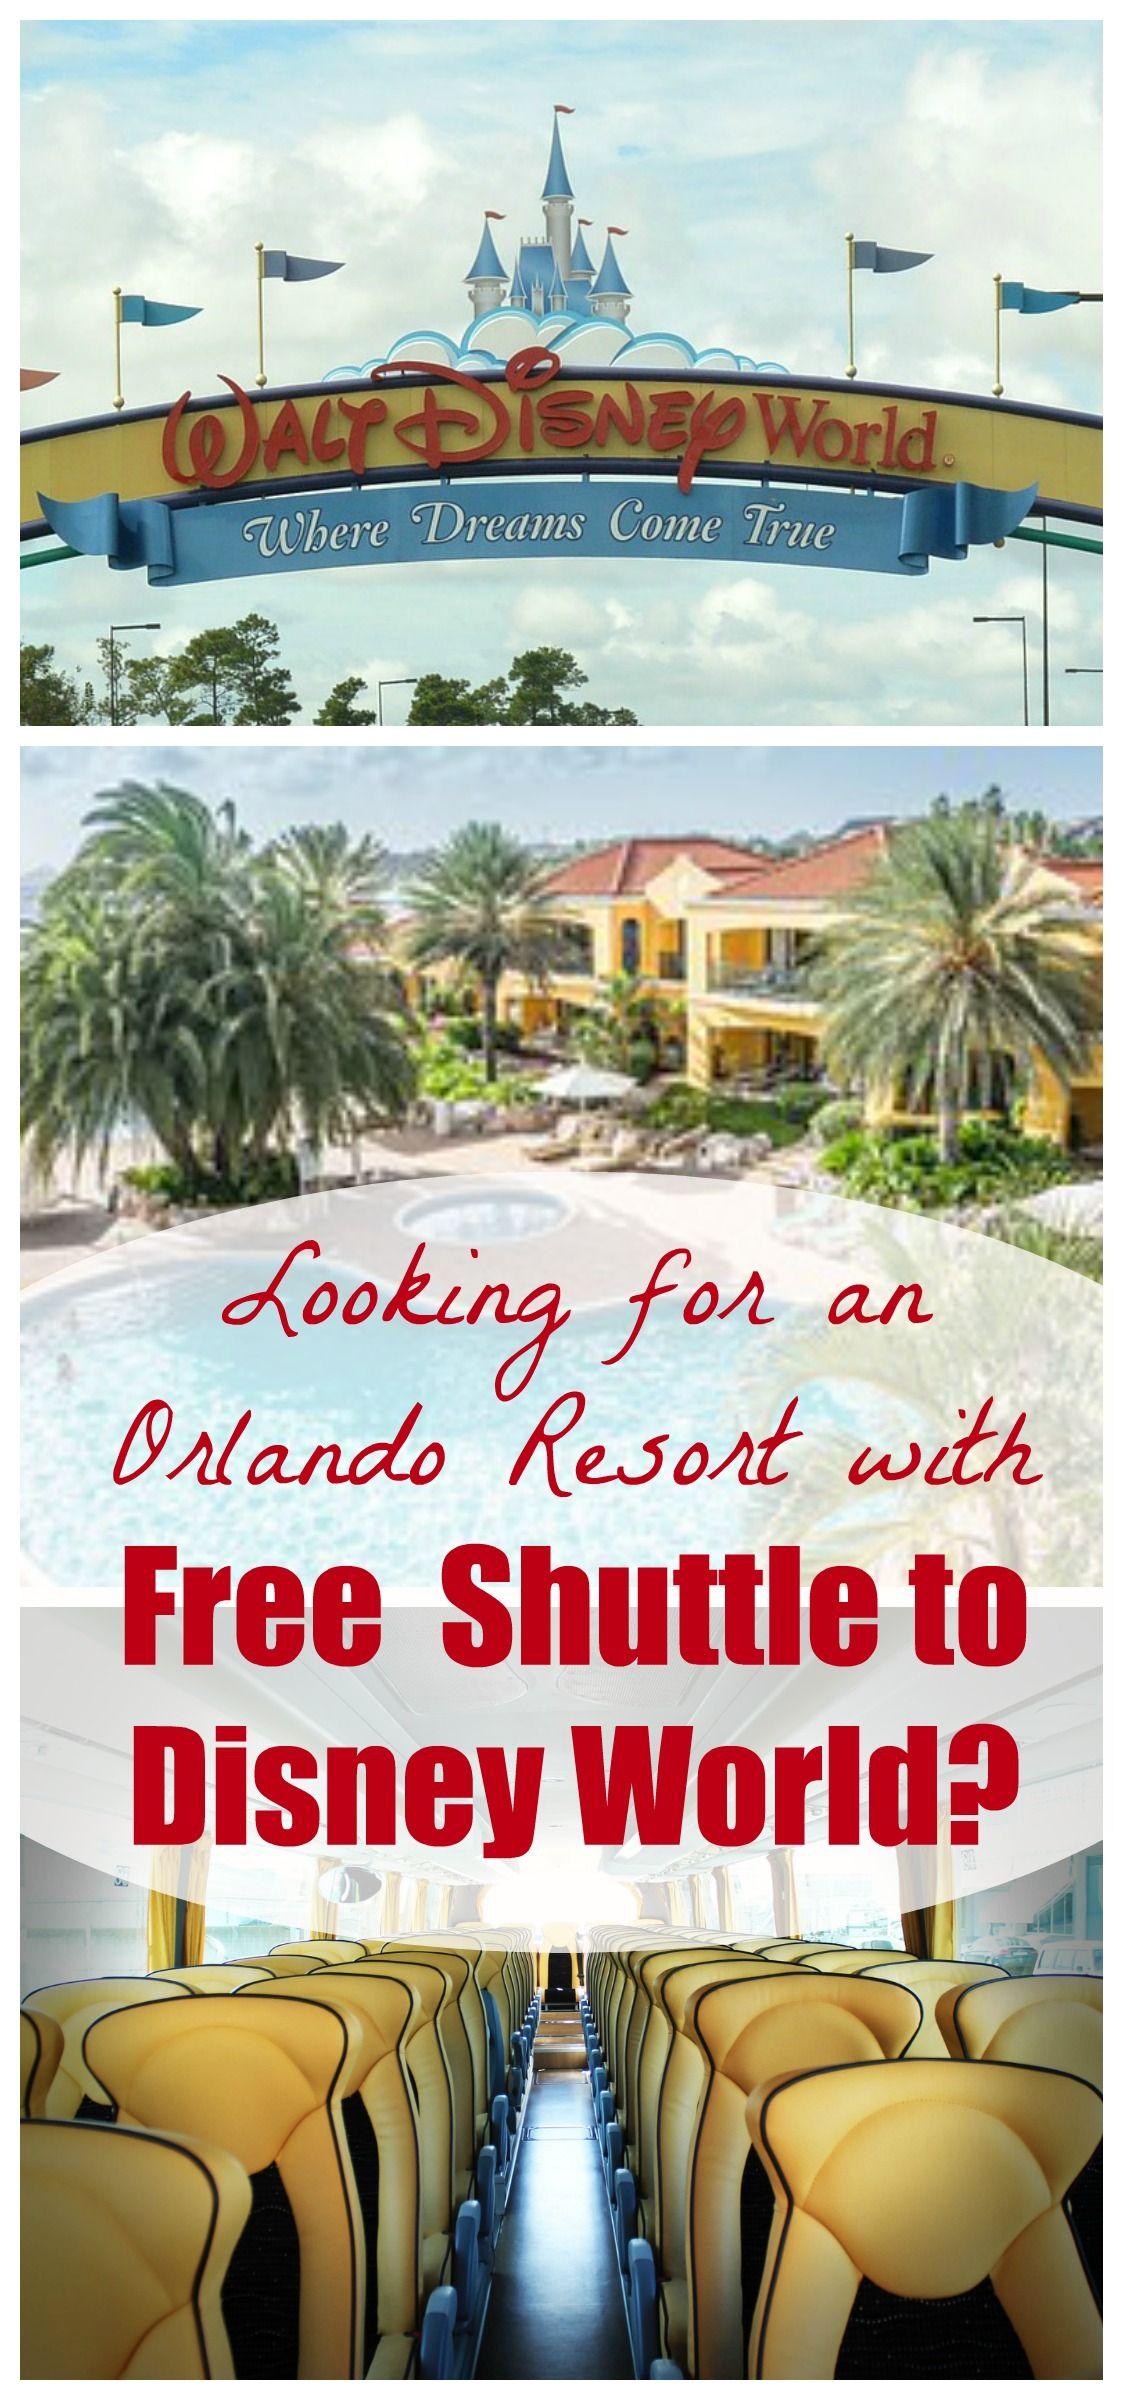 Orlando Resorts Condos That Provide Free Shuttle To Disney World